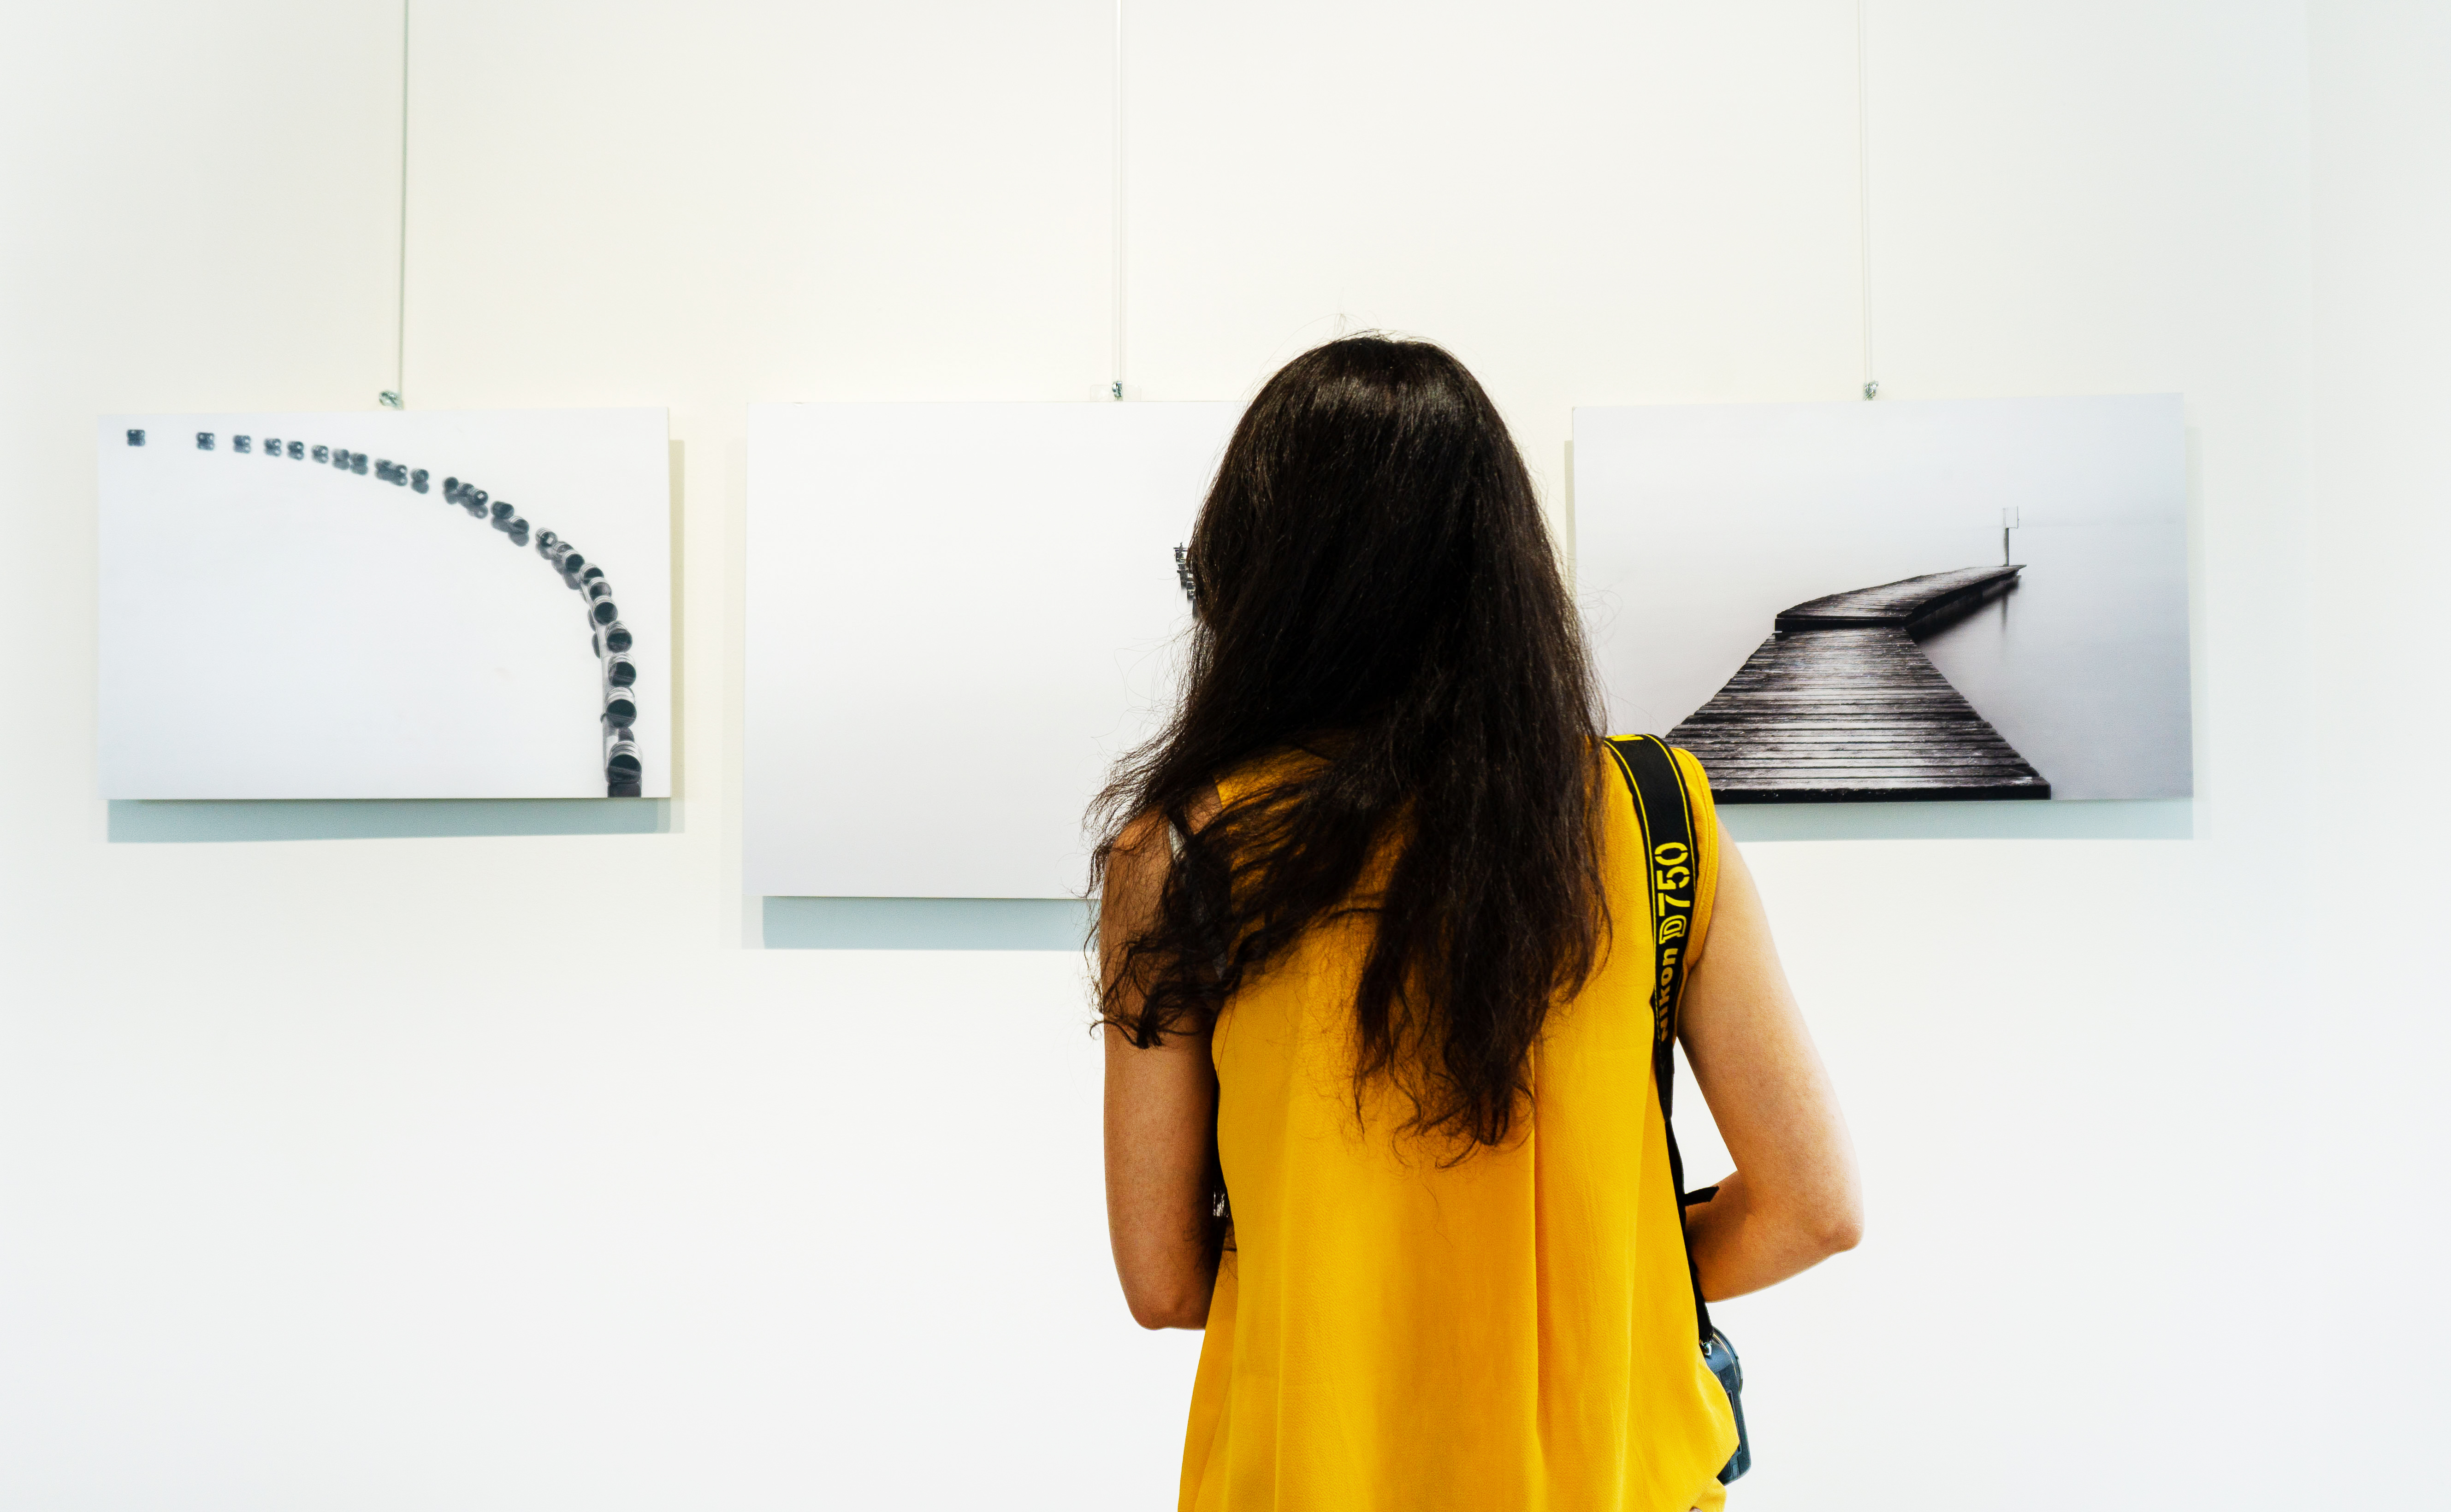 offici.art ad consulting mocu modena cultura